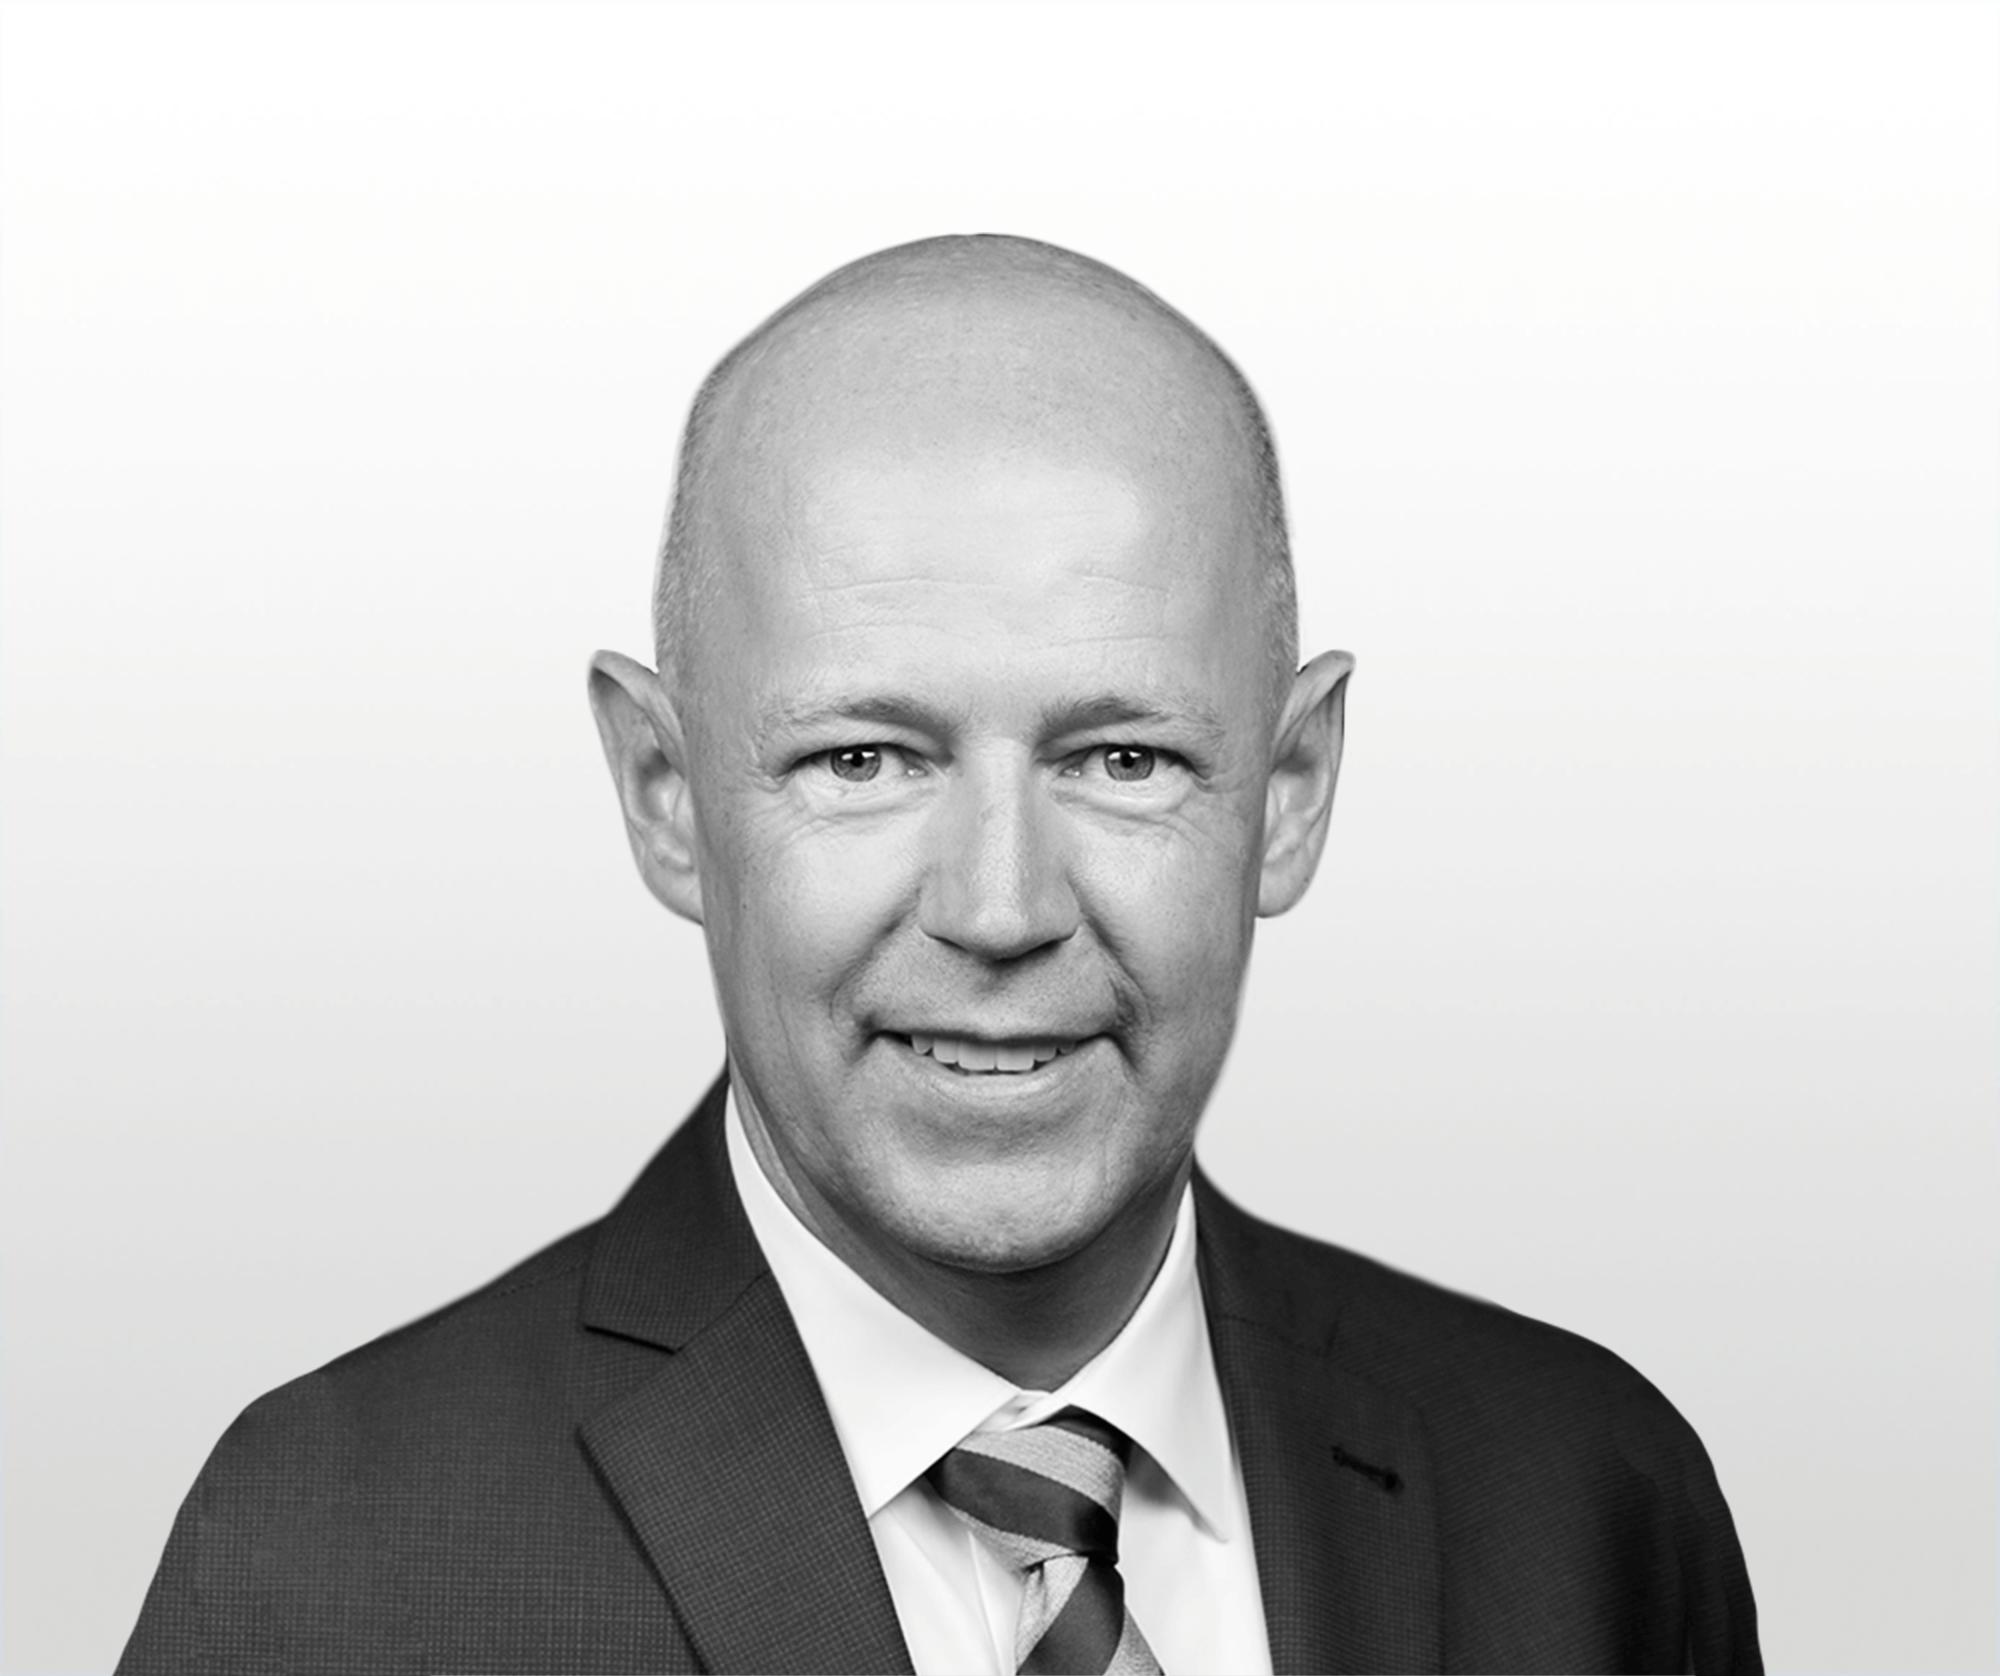 Andreas Wuchner